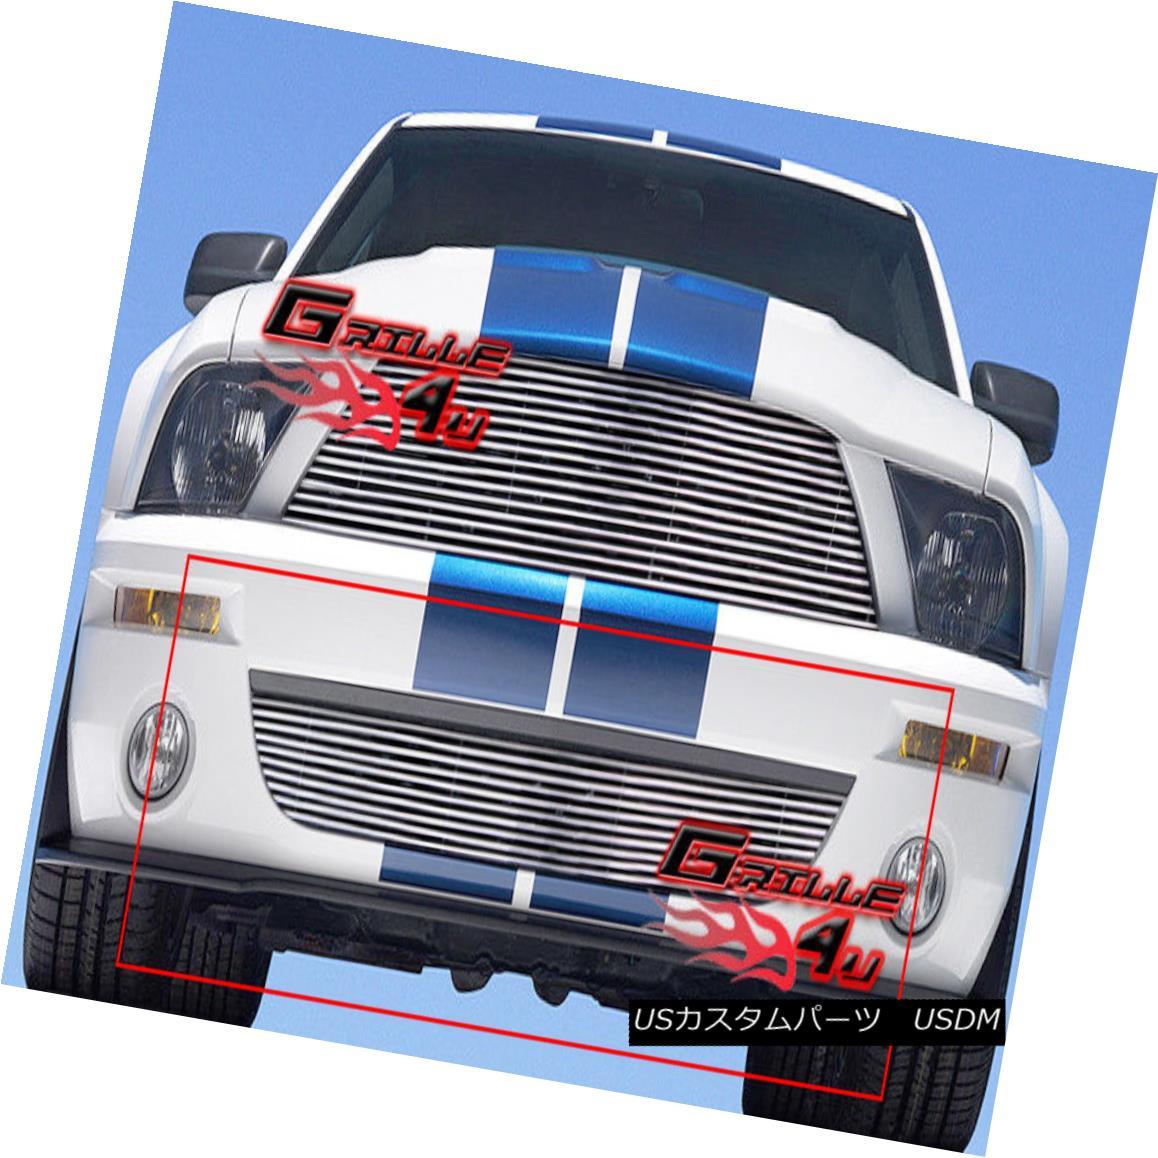 USグリル Fits 07-09 Ford Mustang Shelby GT 500 Lower Bumper Billet Grille フィット07-09フォードマスタングシェルビーGT 500ロワーバンパービレットグリル